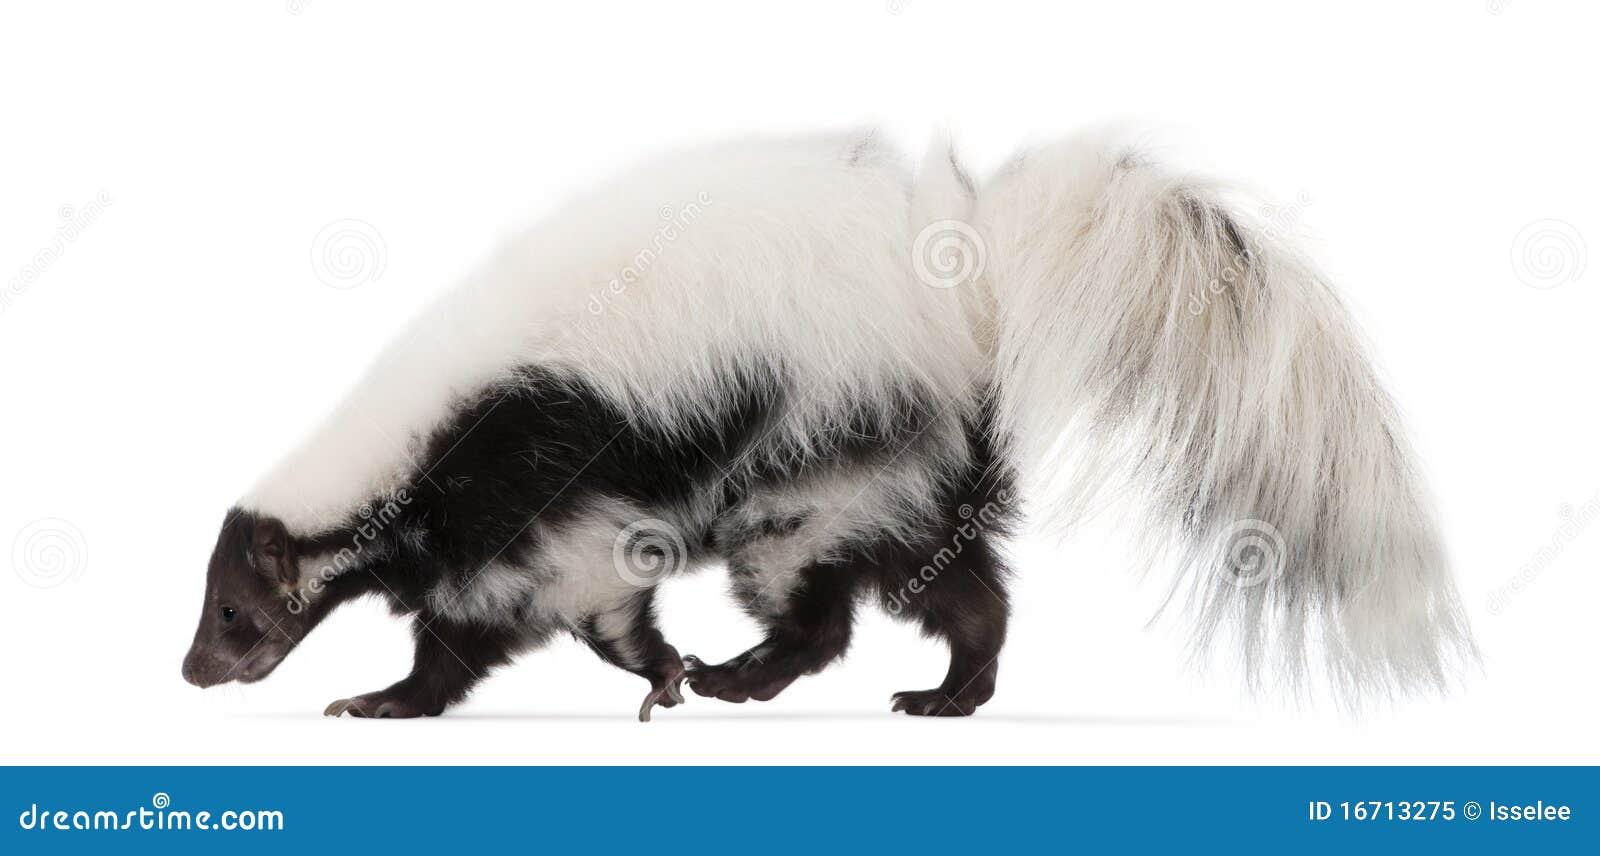 Striped Skunk, Mephitis Mephitis, 5 years old